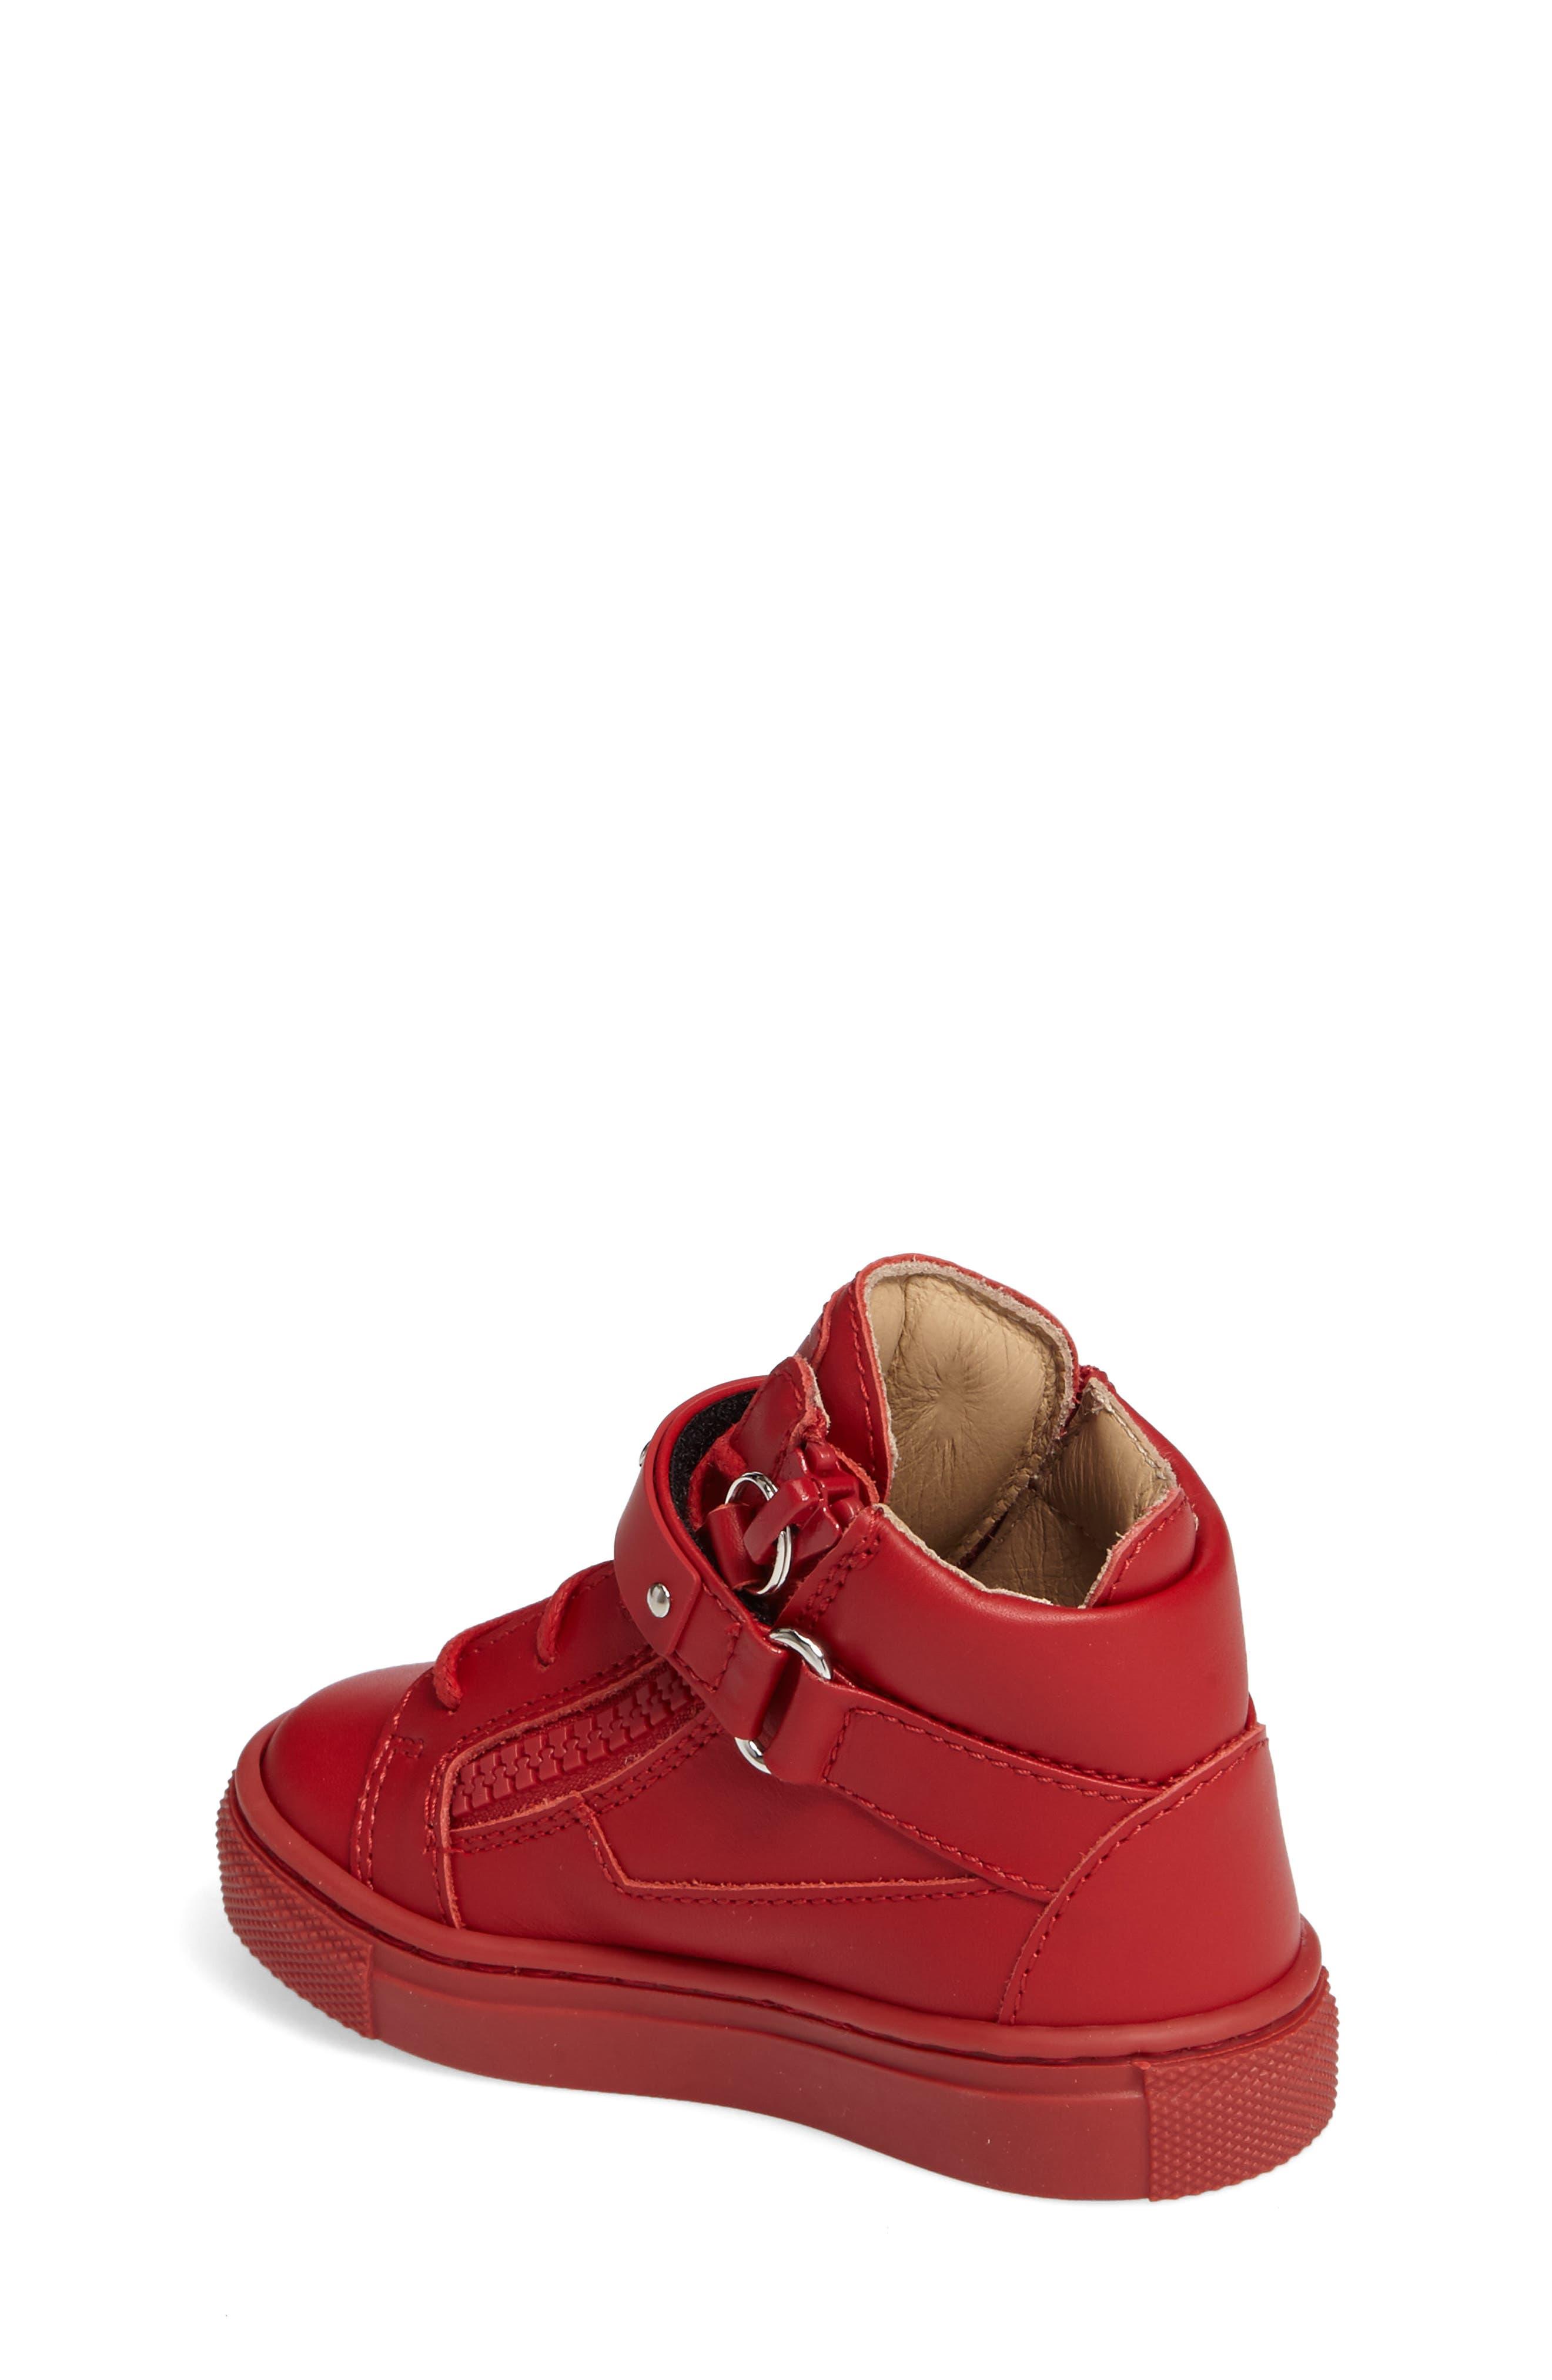 Taylor Junior High Top Sneaker,                             Alternate thumbnail 2, color,                             600